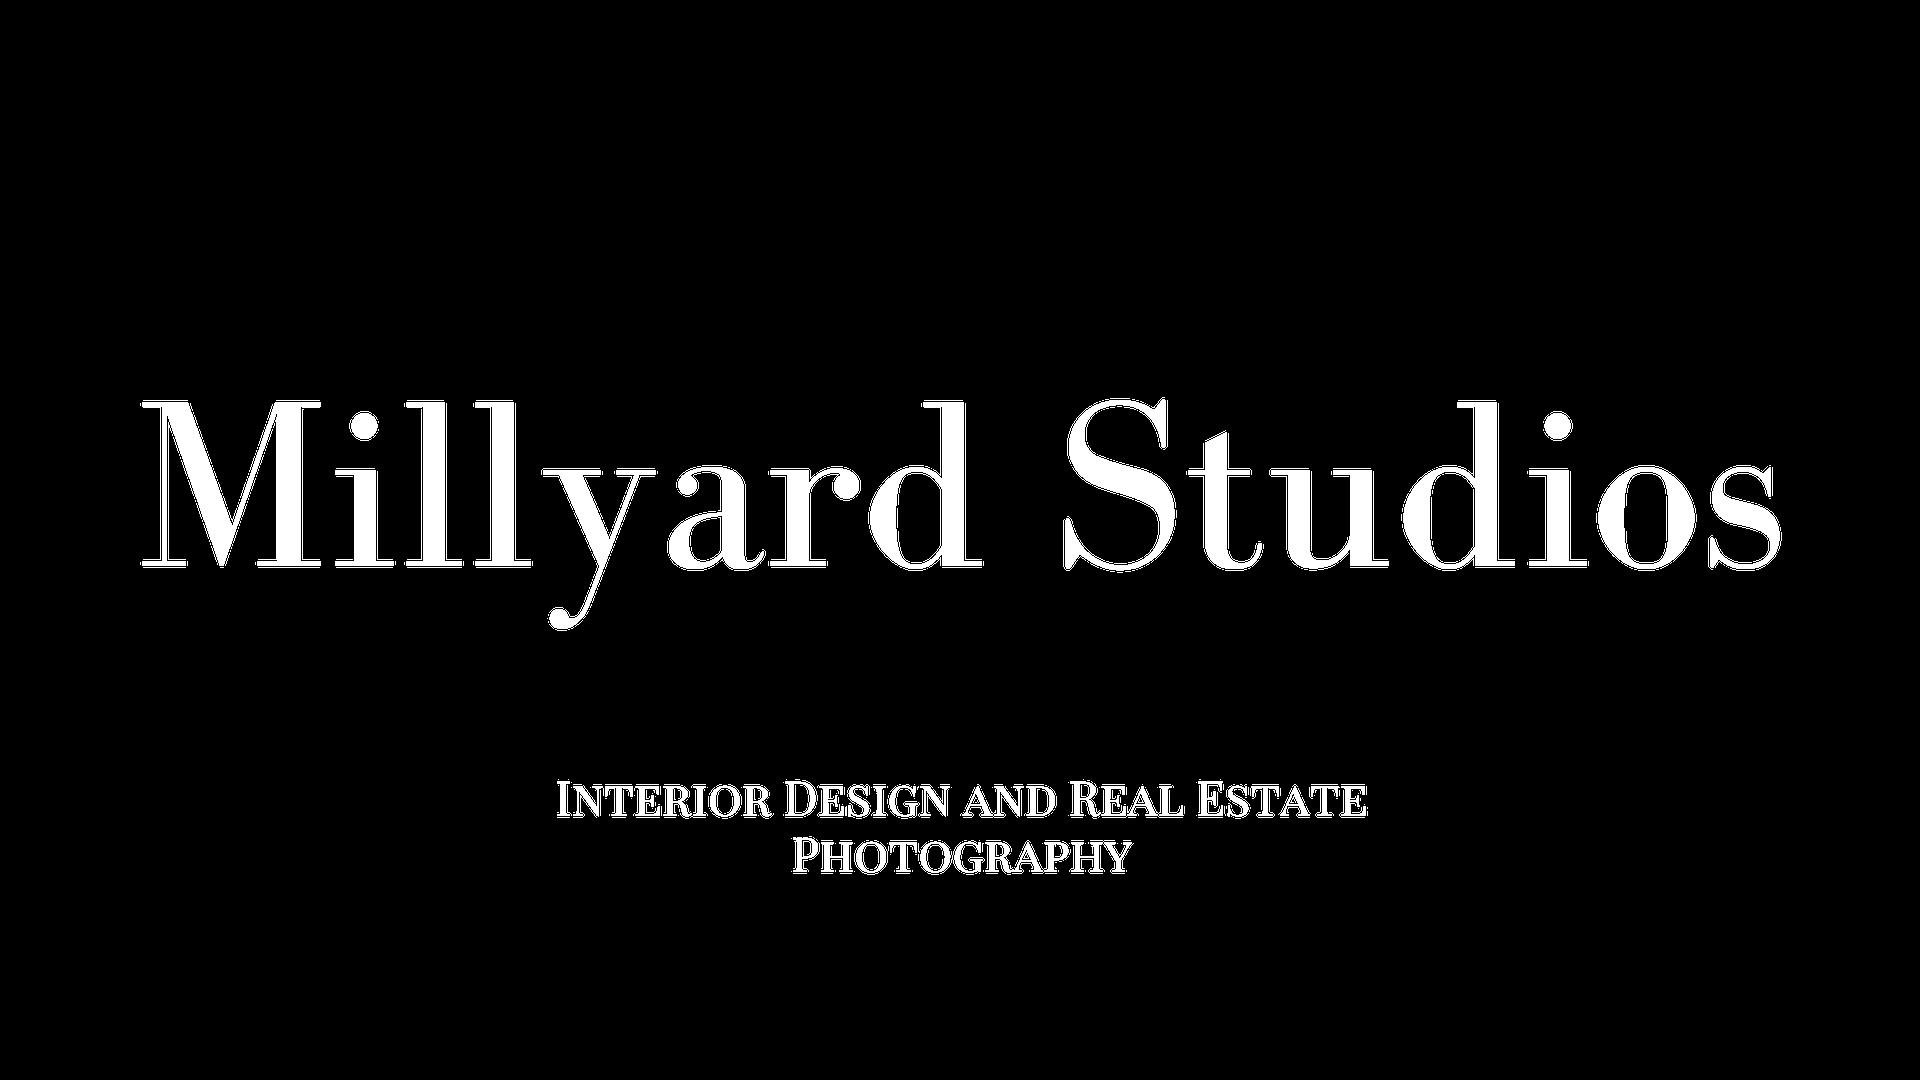 Millyard Studios